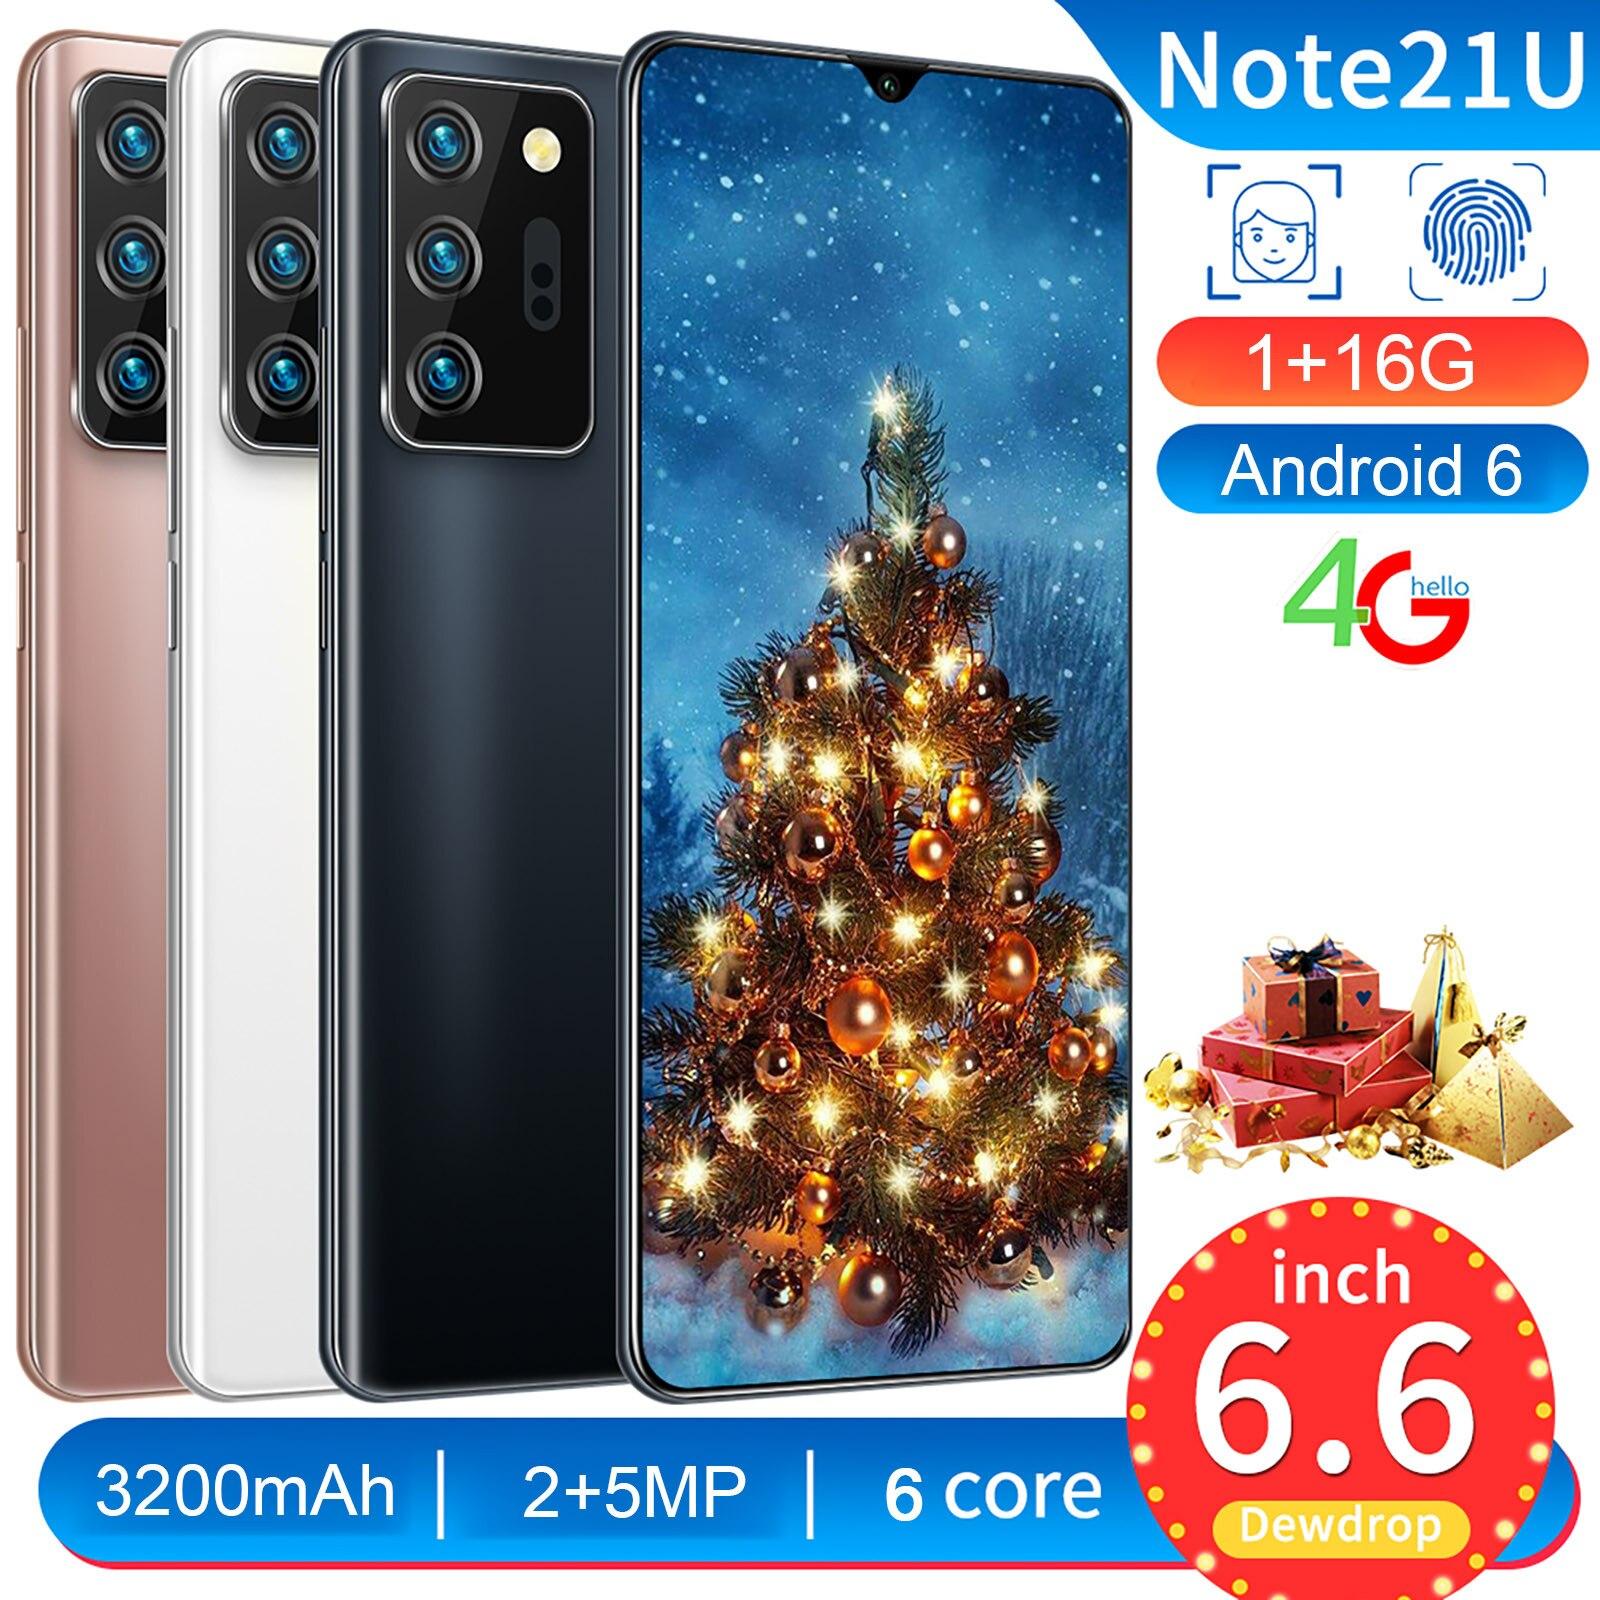 Note21U + 189 téléphones portables Android 6.0 1GB + 16GB Face ID 4G Smartphones Superprice Offre Spéciale charge rapide